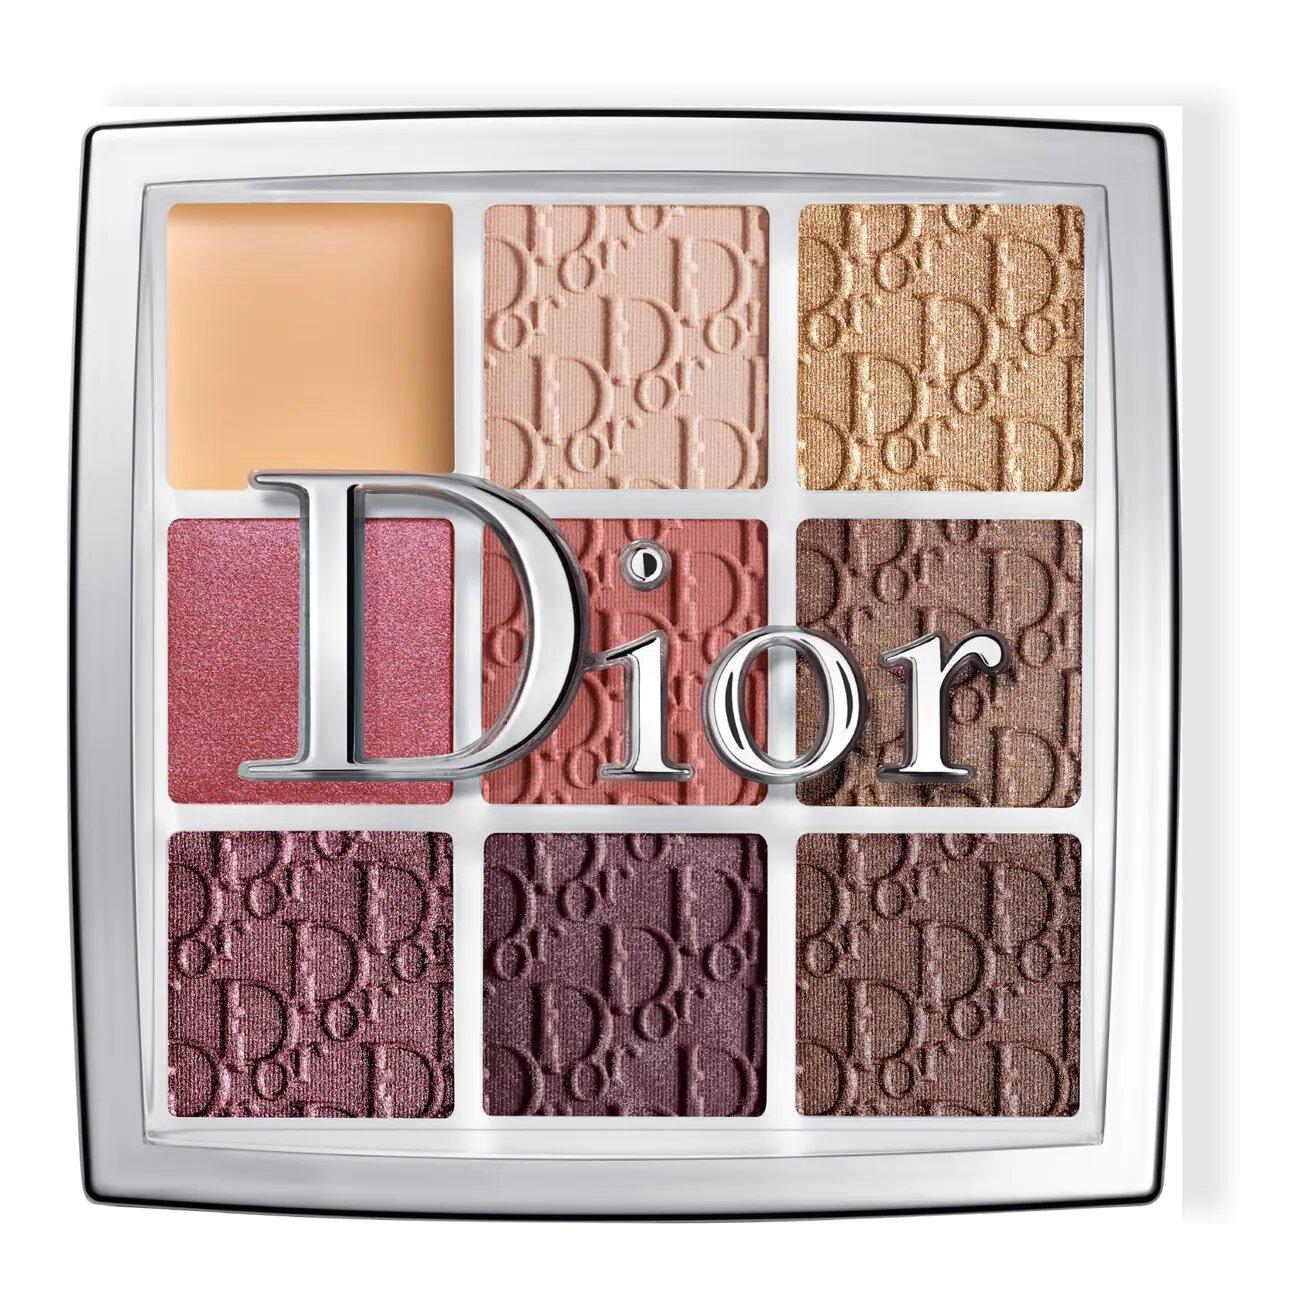 Dior Backstage Eye Palette Paleta de ojos